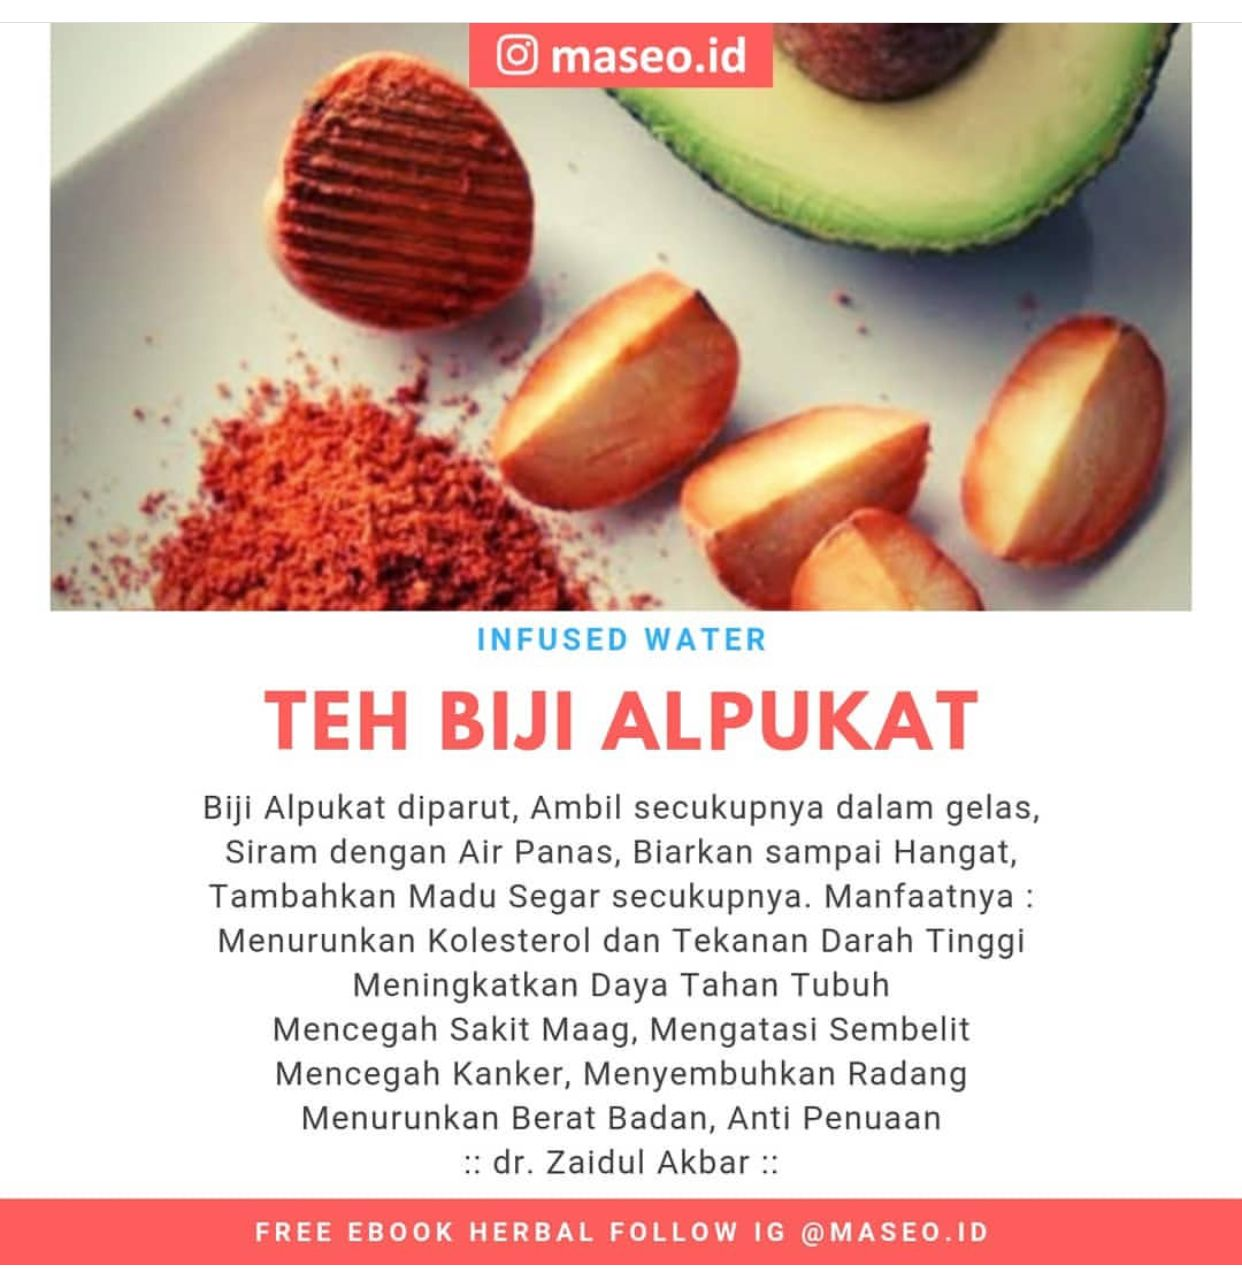 Teh Biji Alpukat Resep Diet Sehat Resep Diet Kesehatan Alami